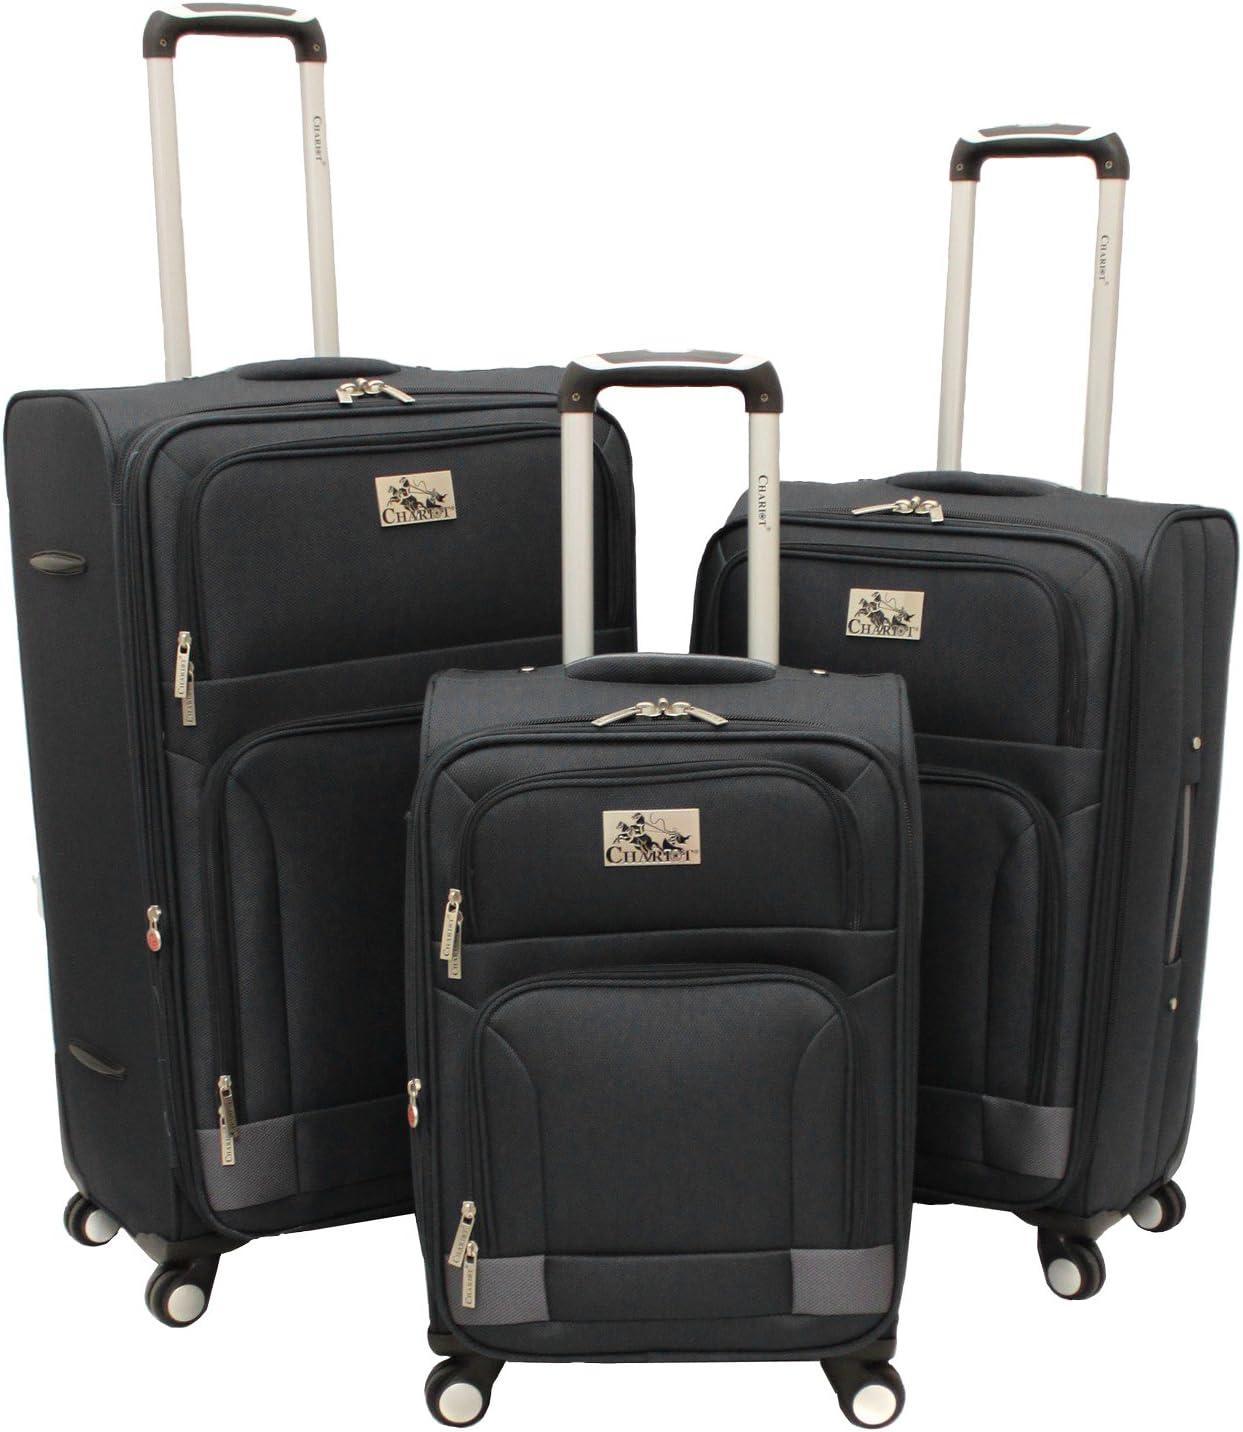 Chariot Armada 3-piece Hardside Tsa Lock Upright Spinner Luggage Set-Tan Pink One Size